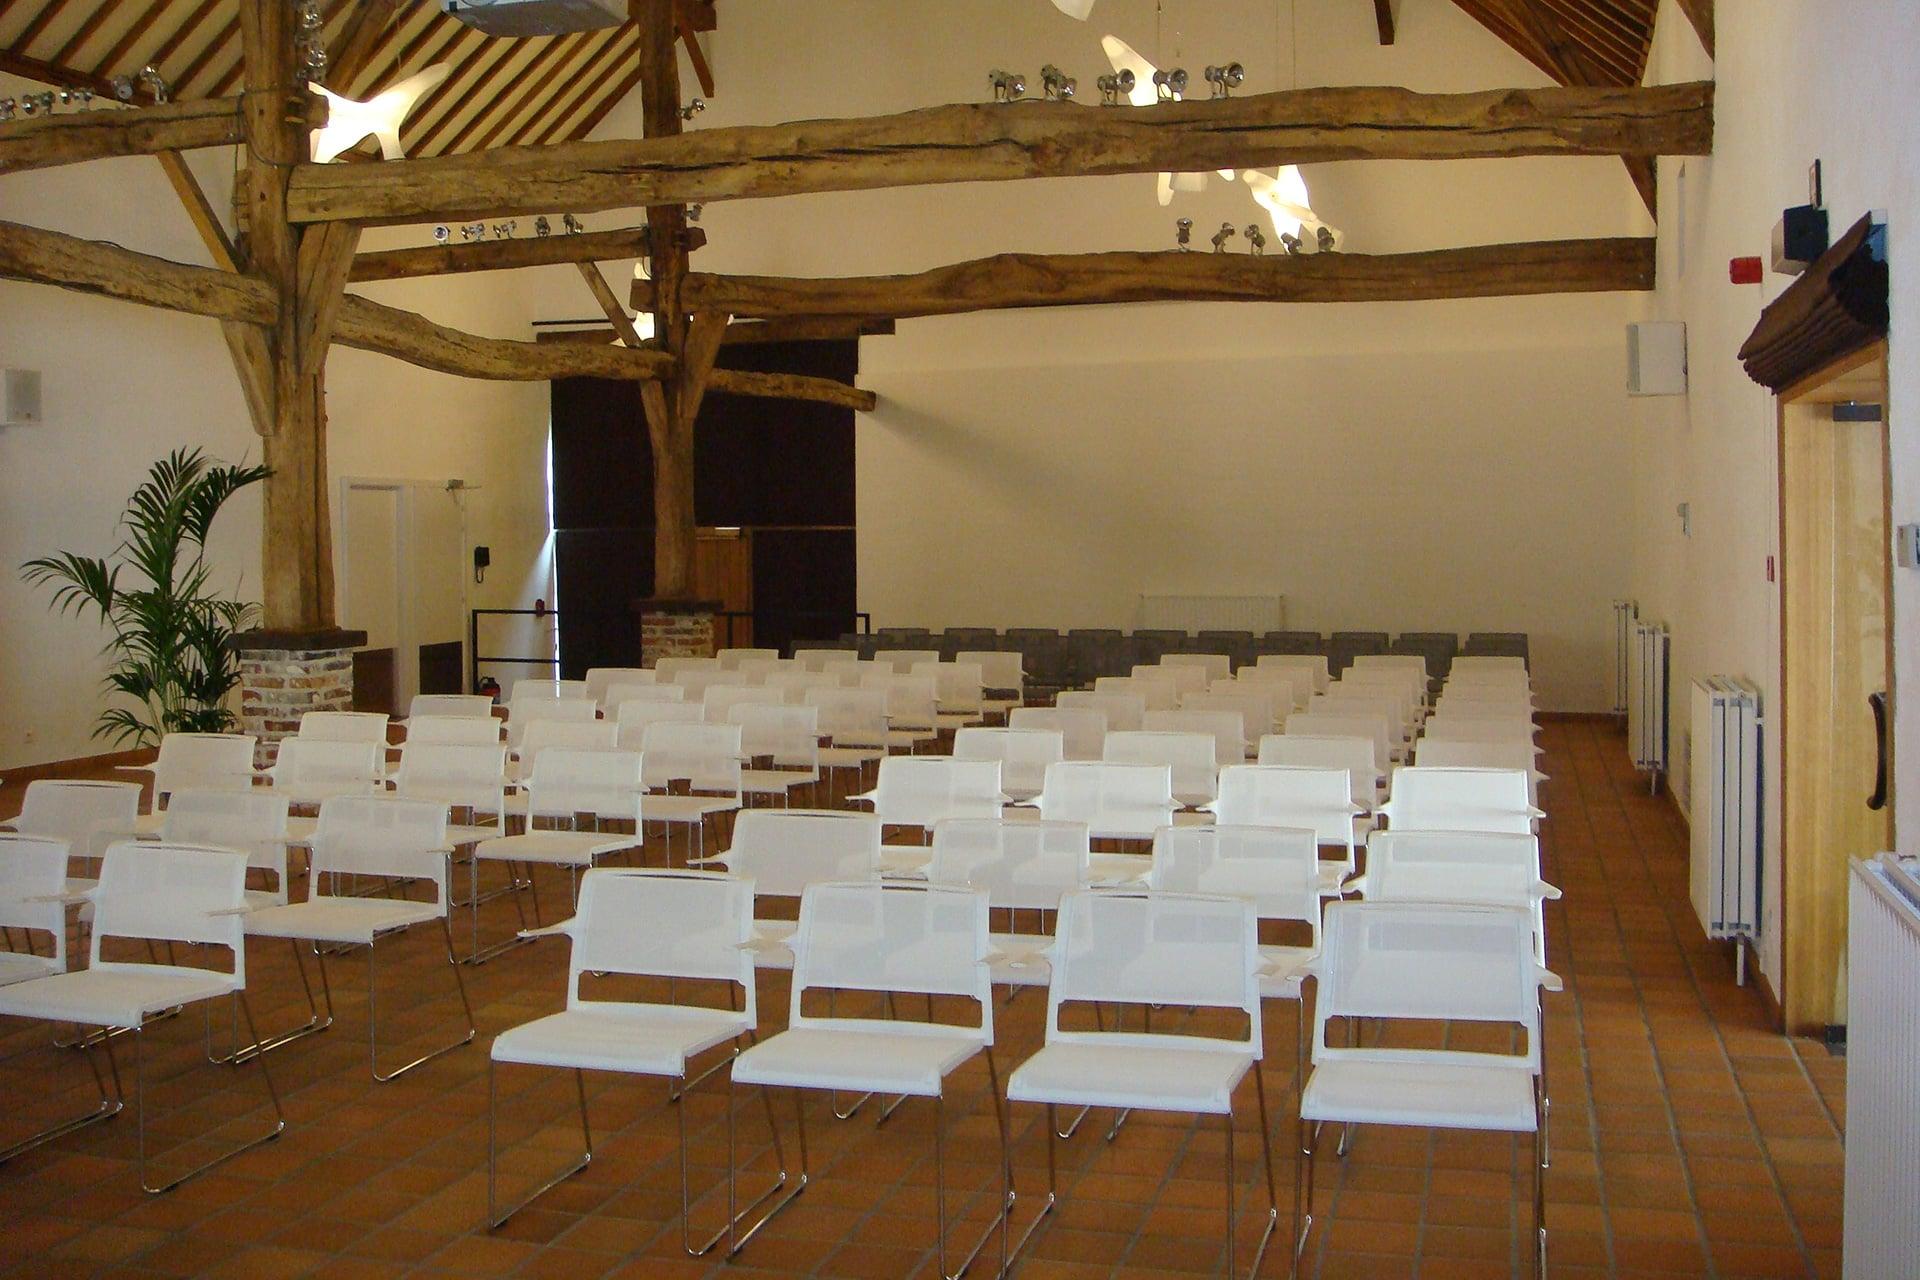 Conférences - Hof ter Musschen